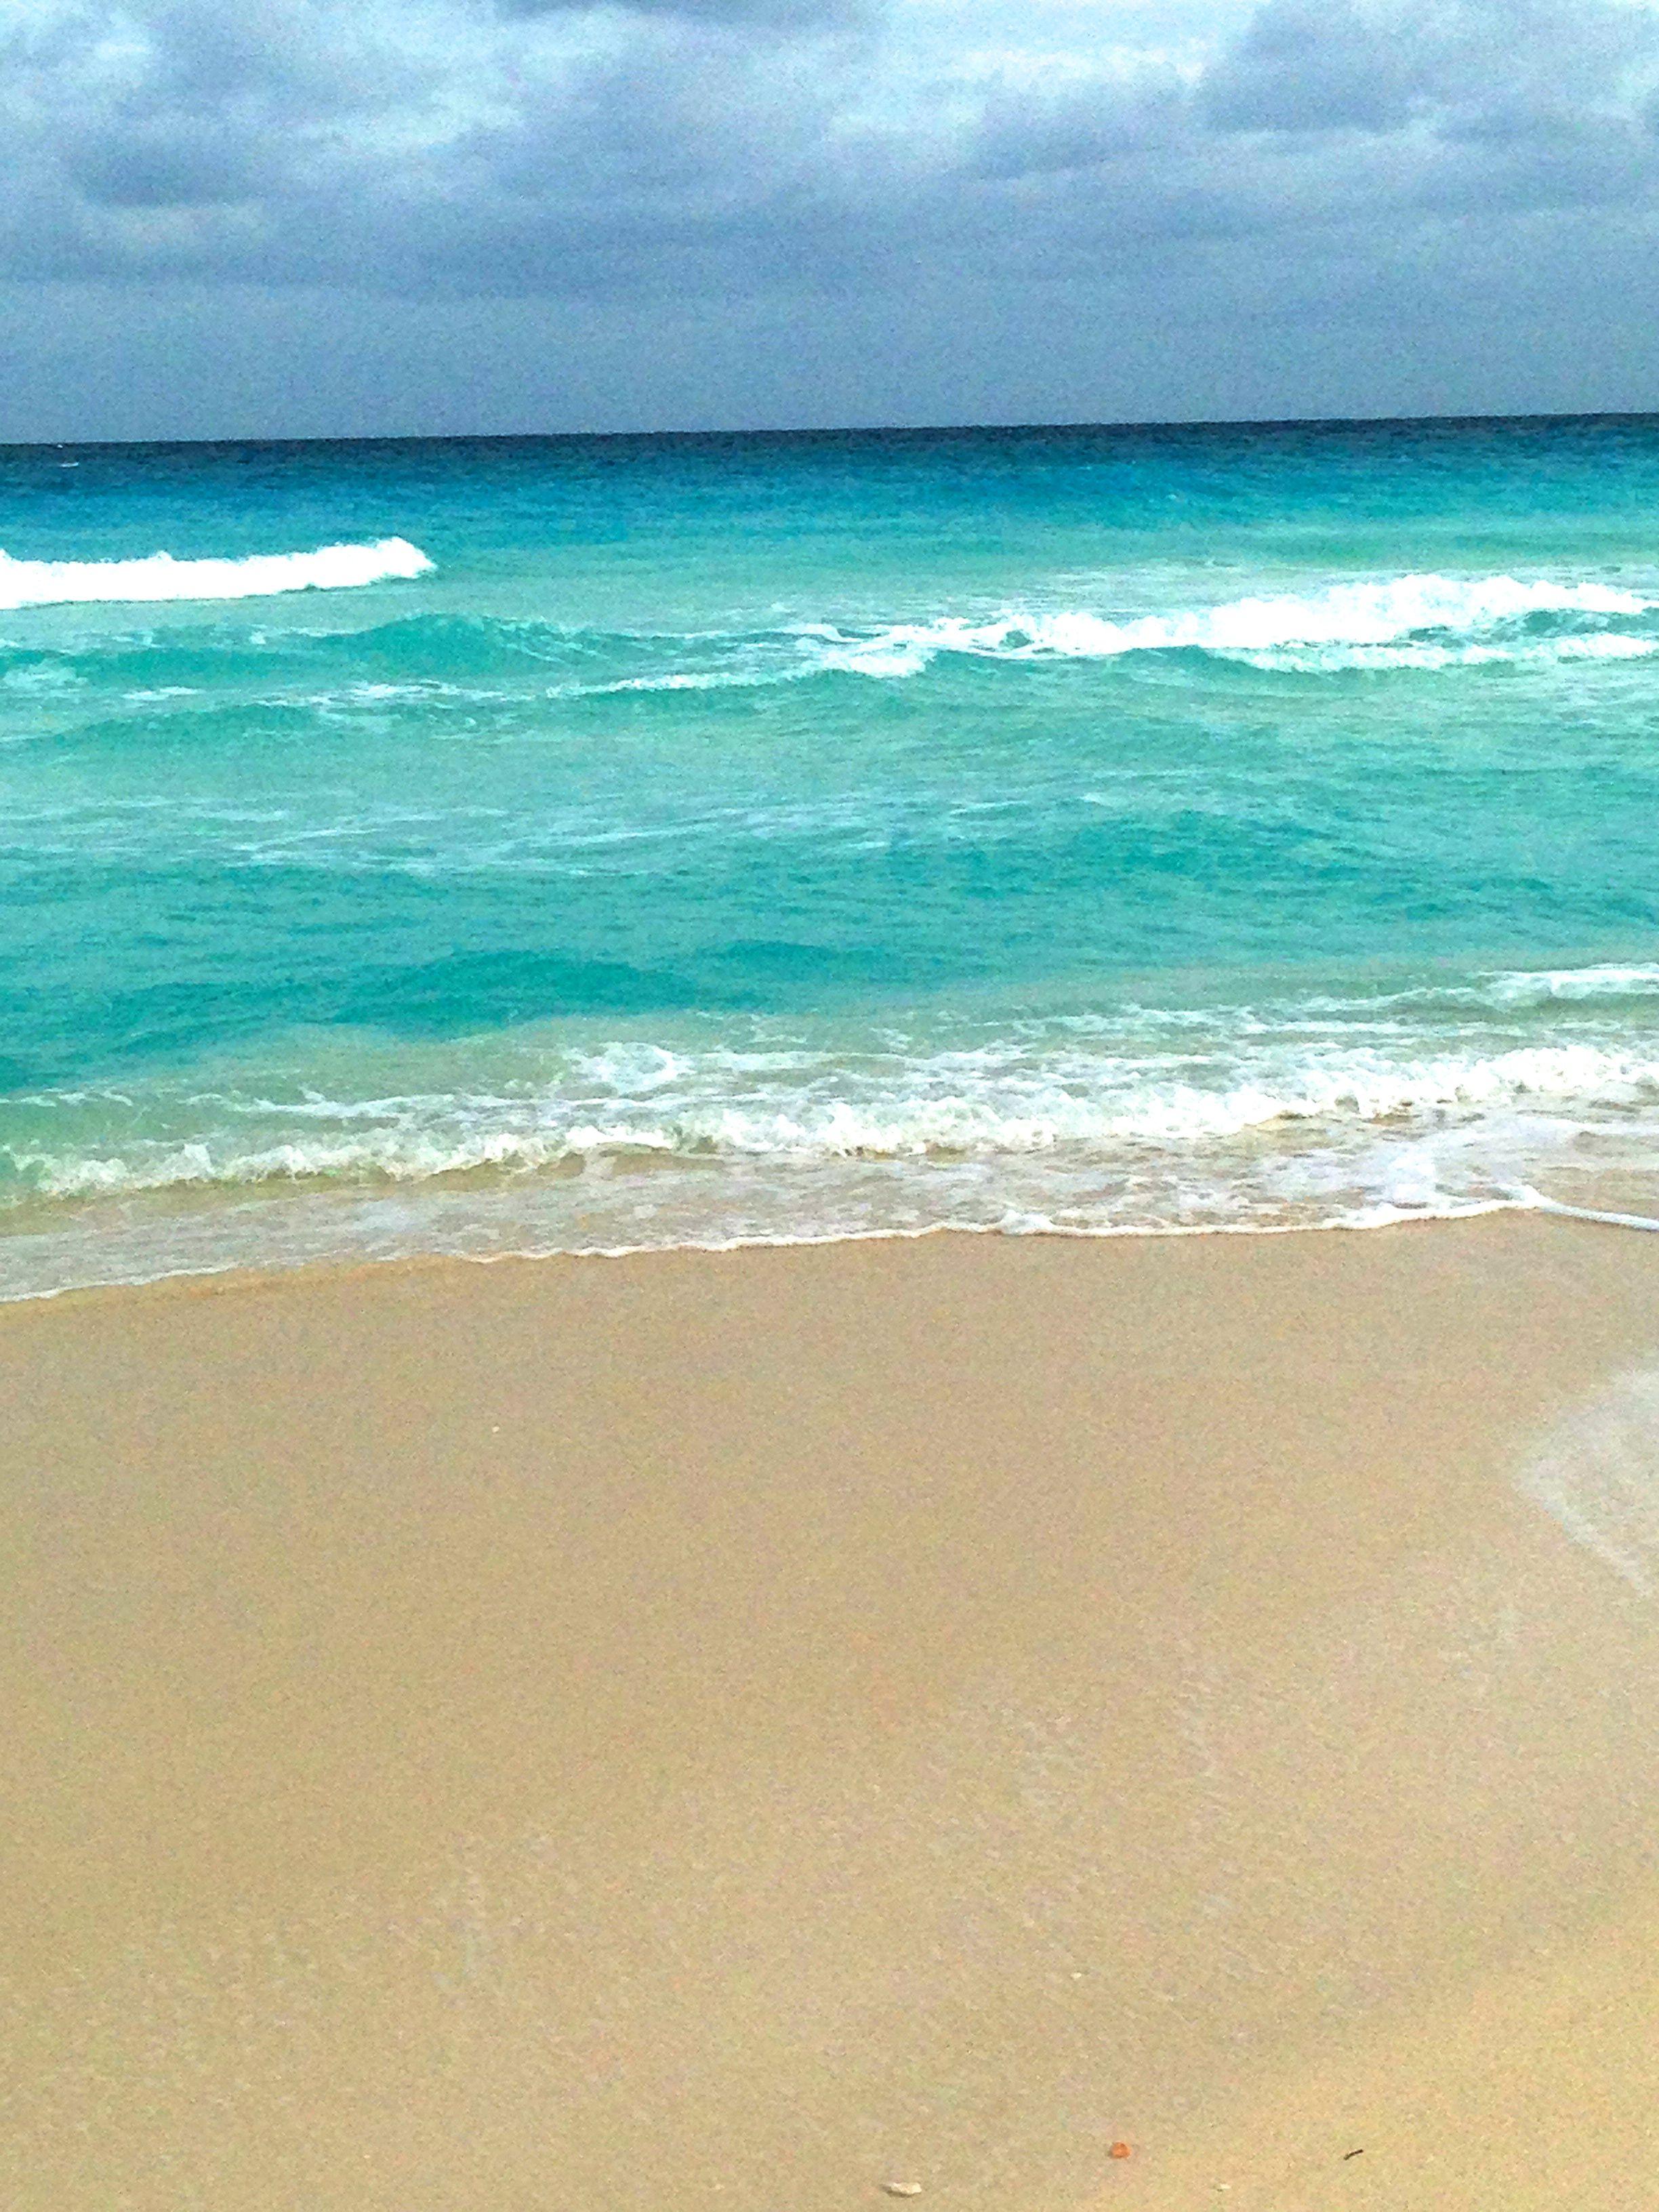 Cancun One Of The Most Beautiful Beaches I Ve Ever Seen Most Beautiful Beaches Beautiful Beaches Cancun